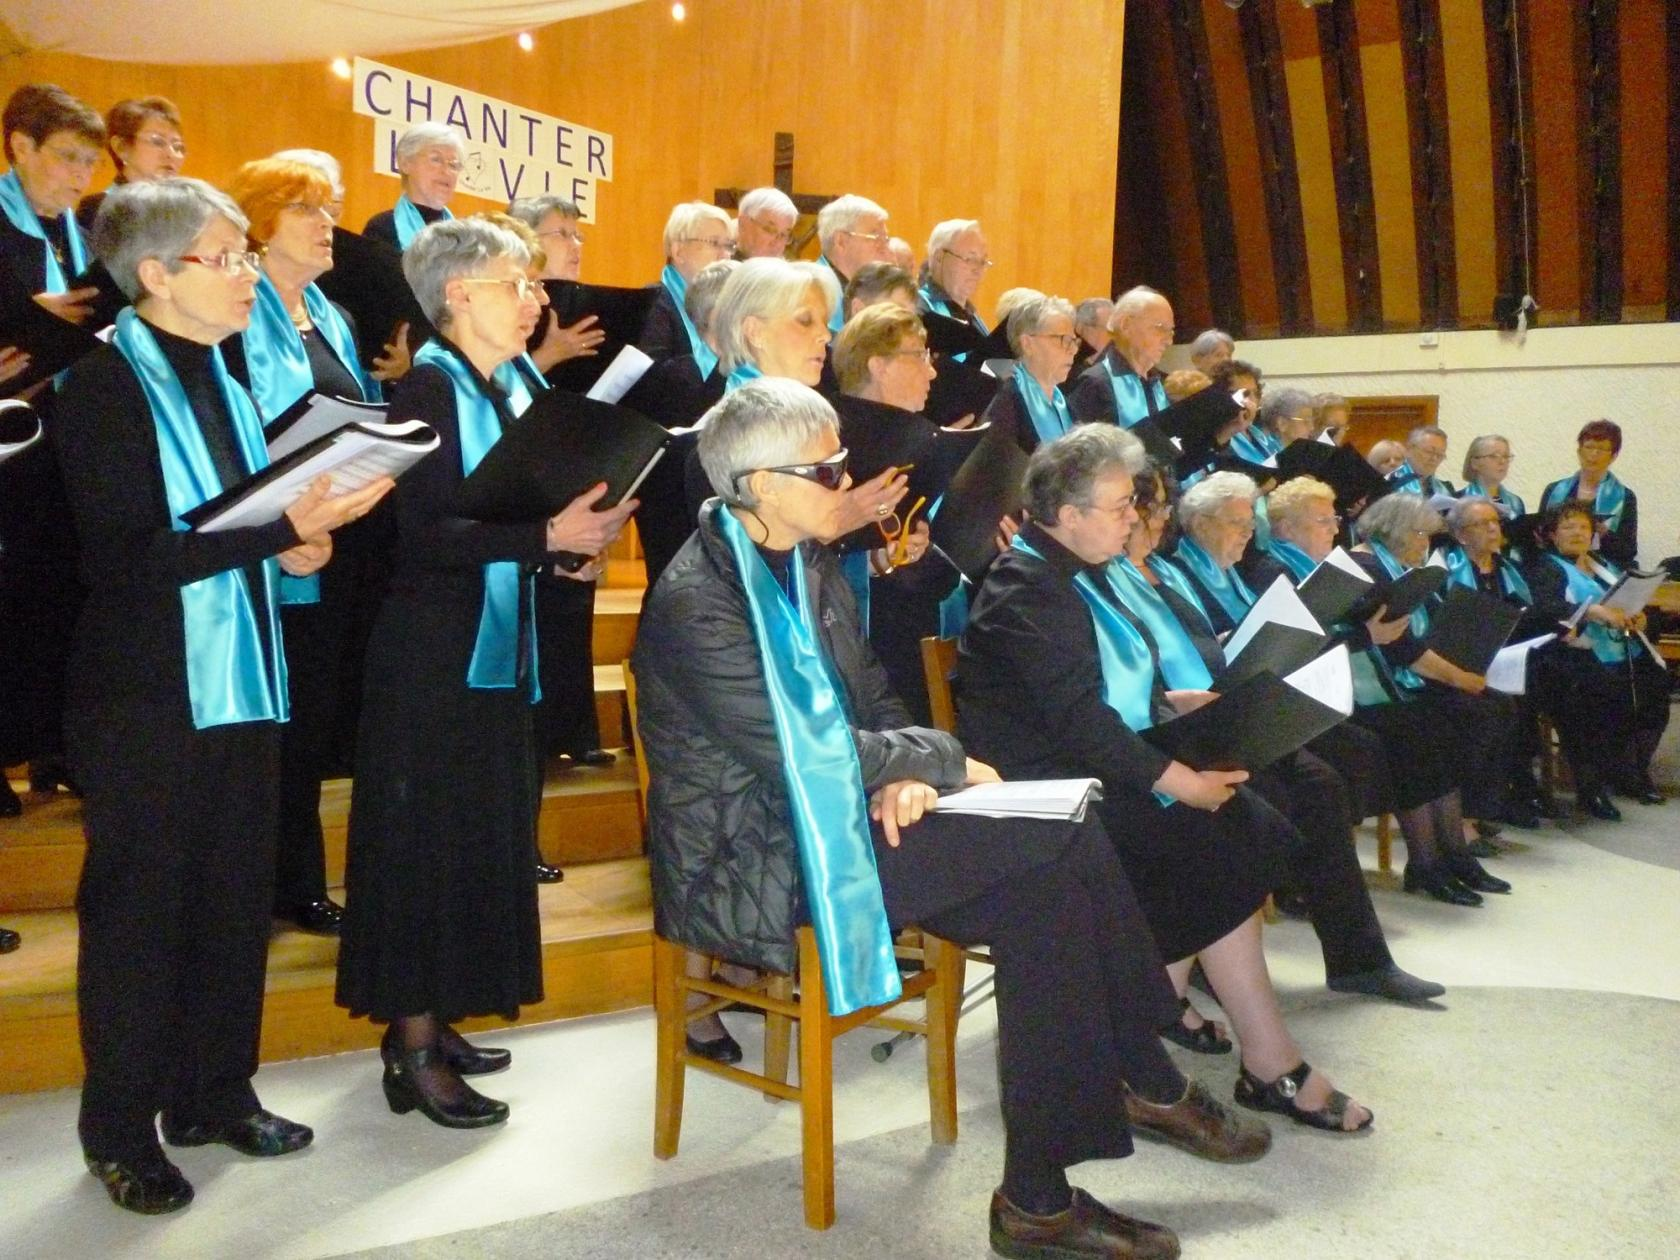 Chanter la vie Saint-Herblain